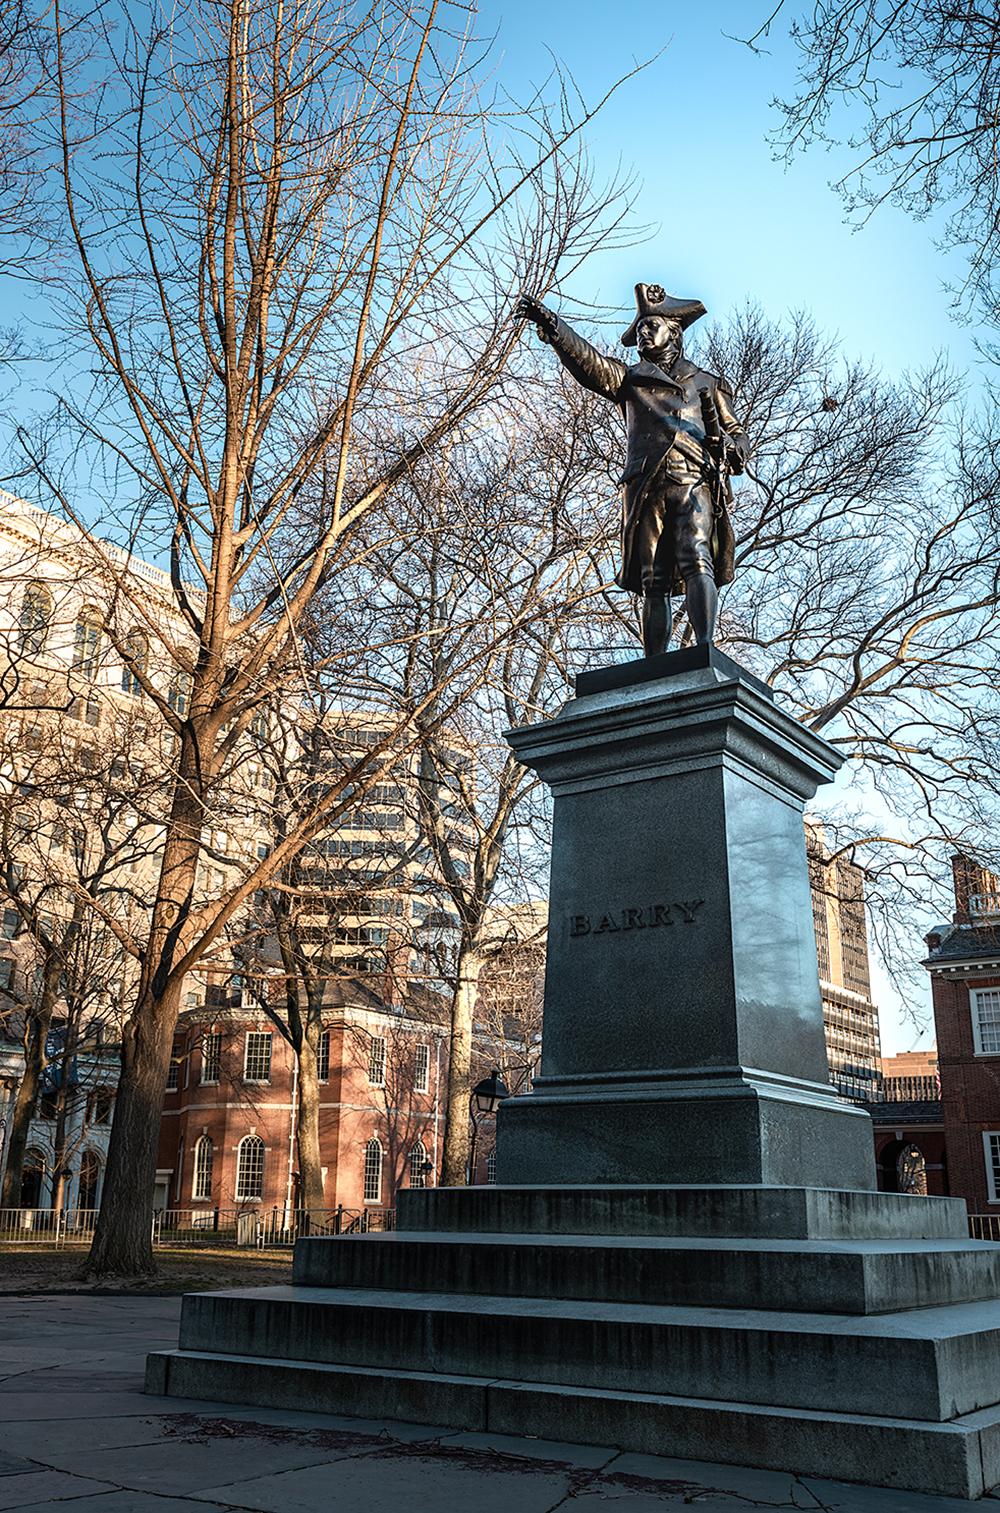 John Barry Statue